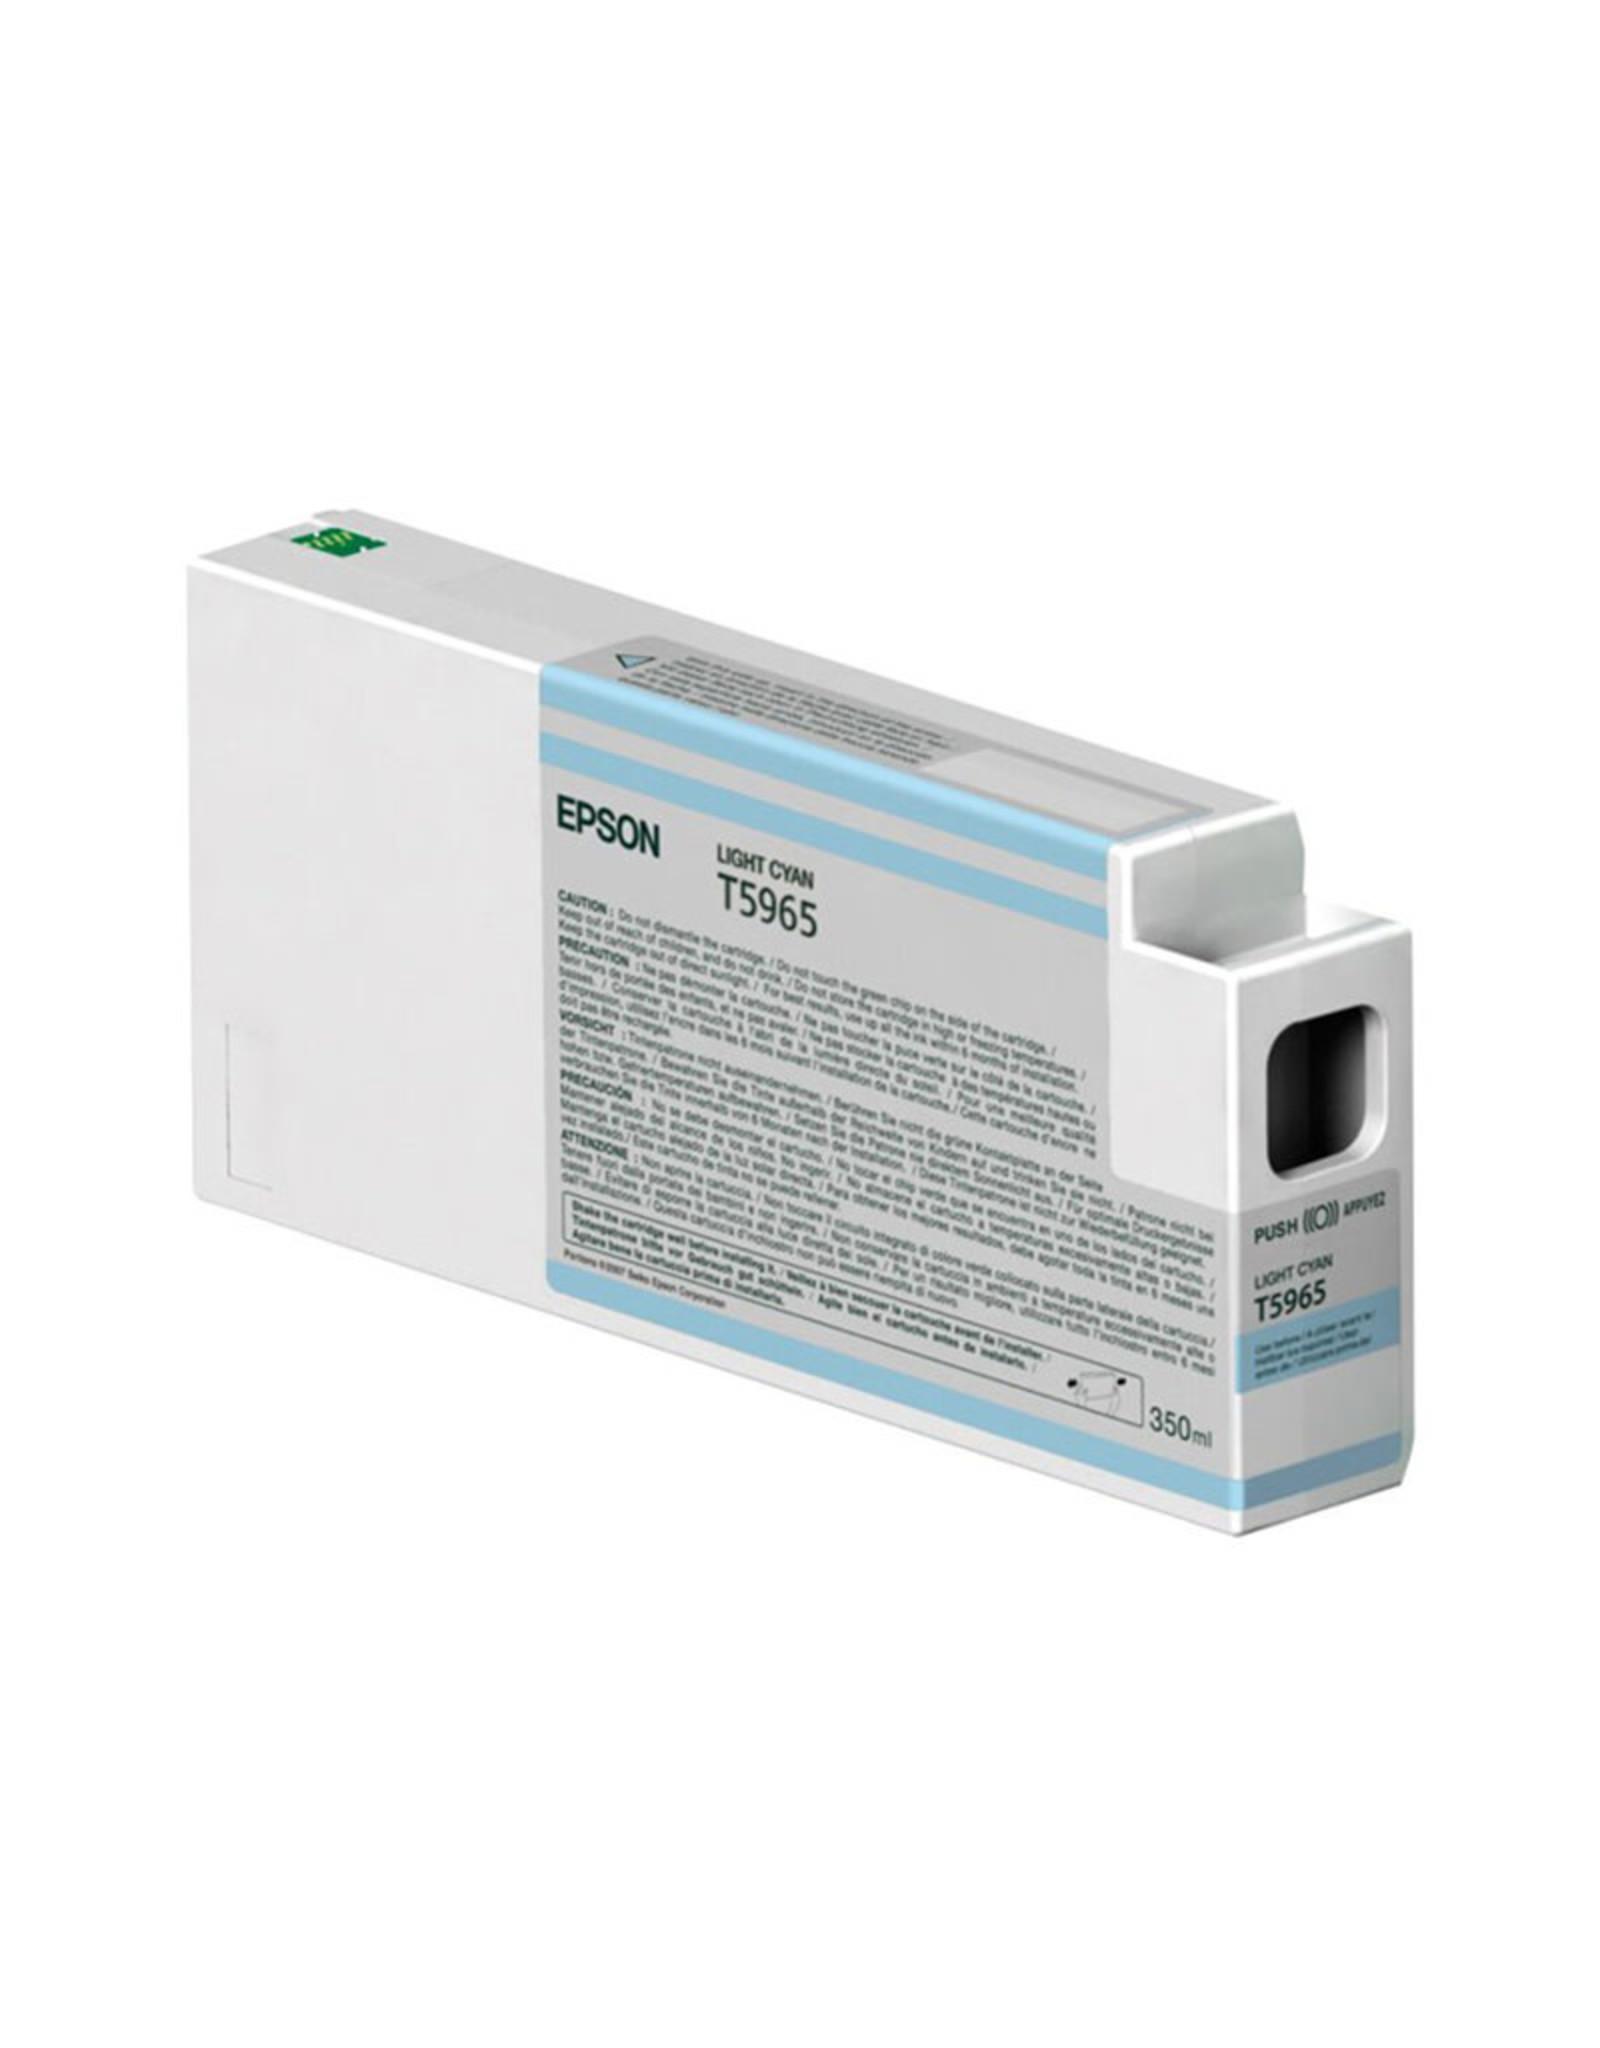 Epson Epson Light Cyan Ultra Chrome HDR Ink 350ml for SP7900, 9900, 7890 & 9890